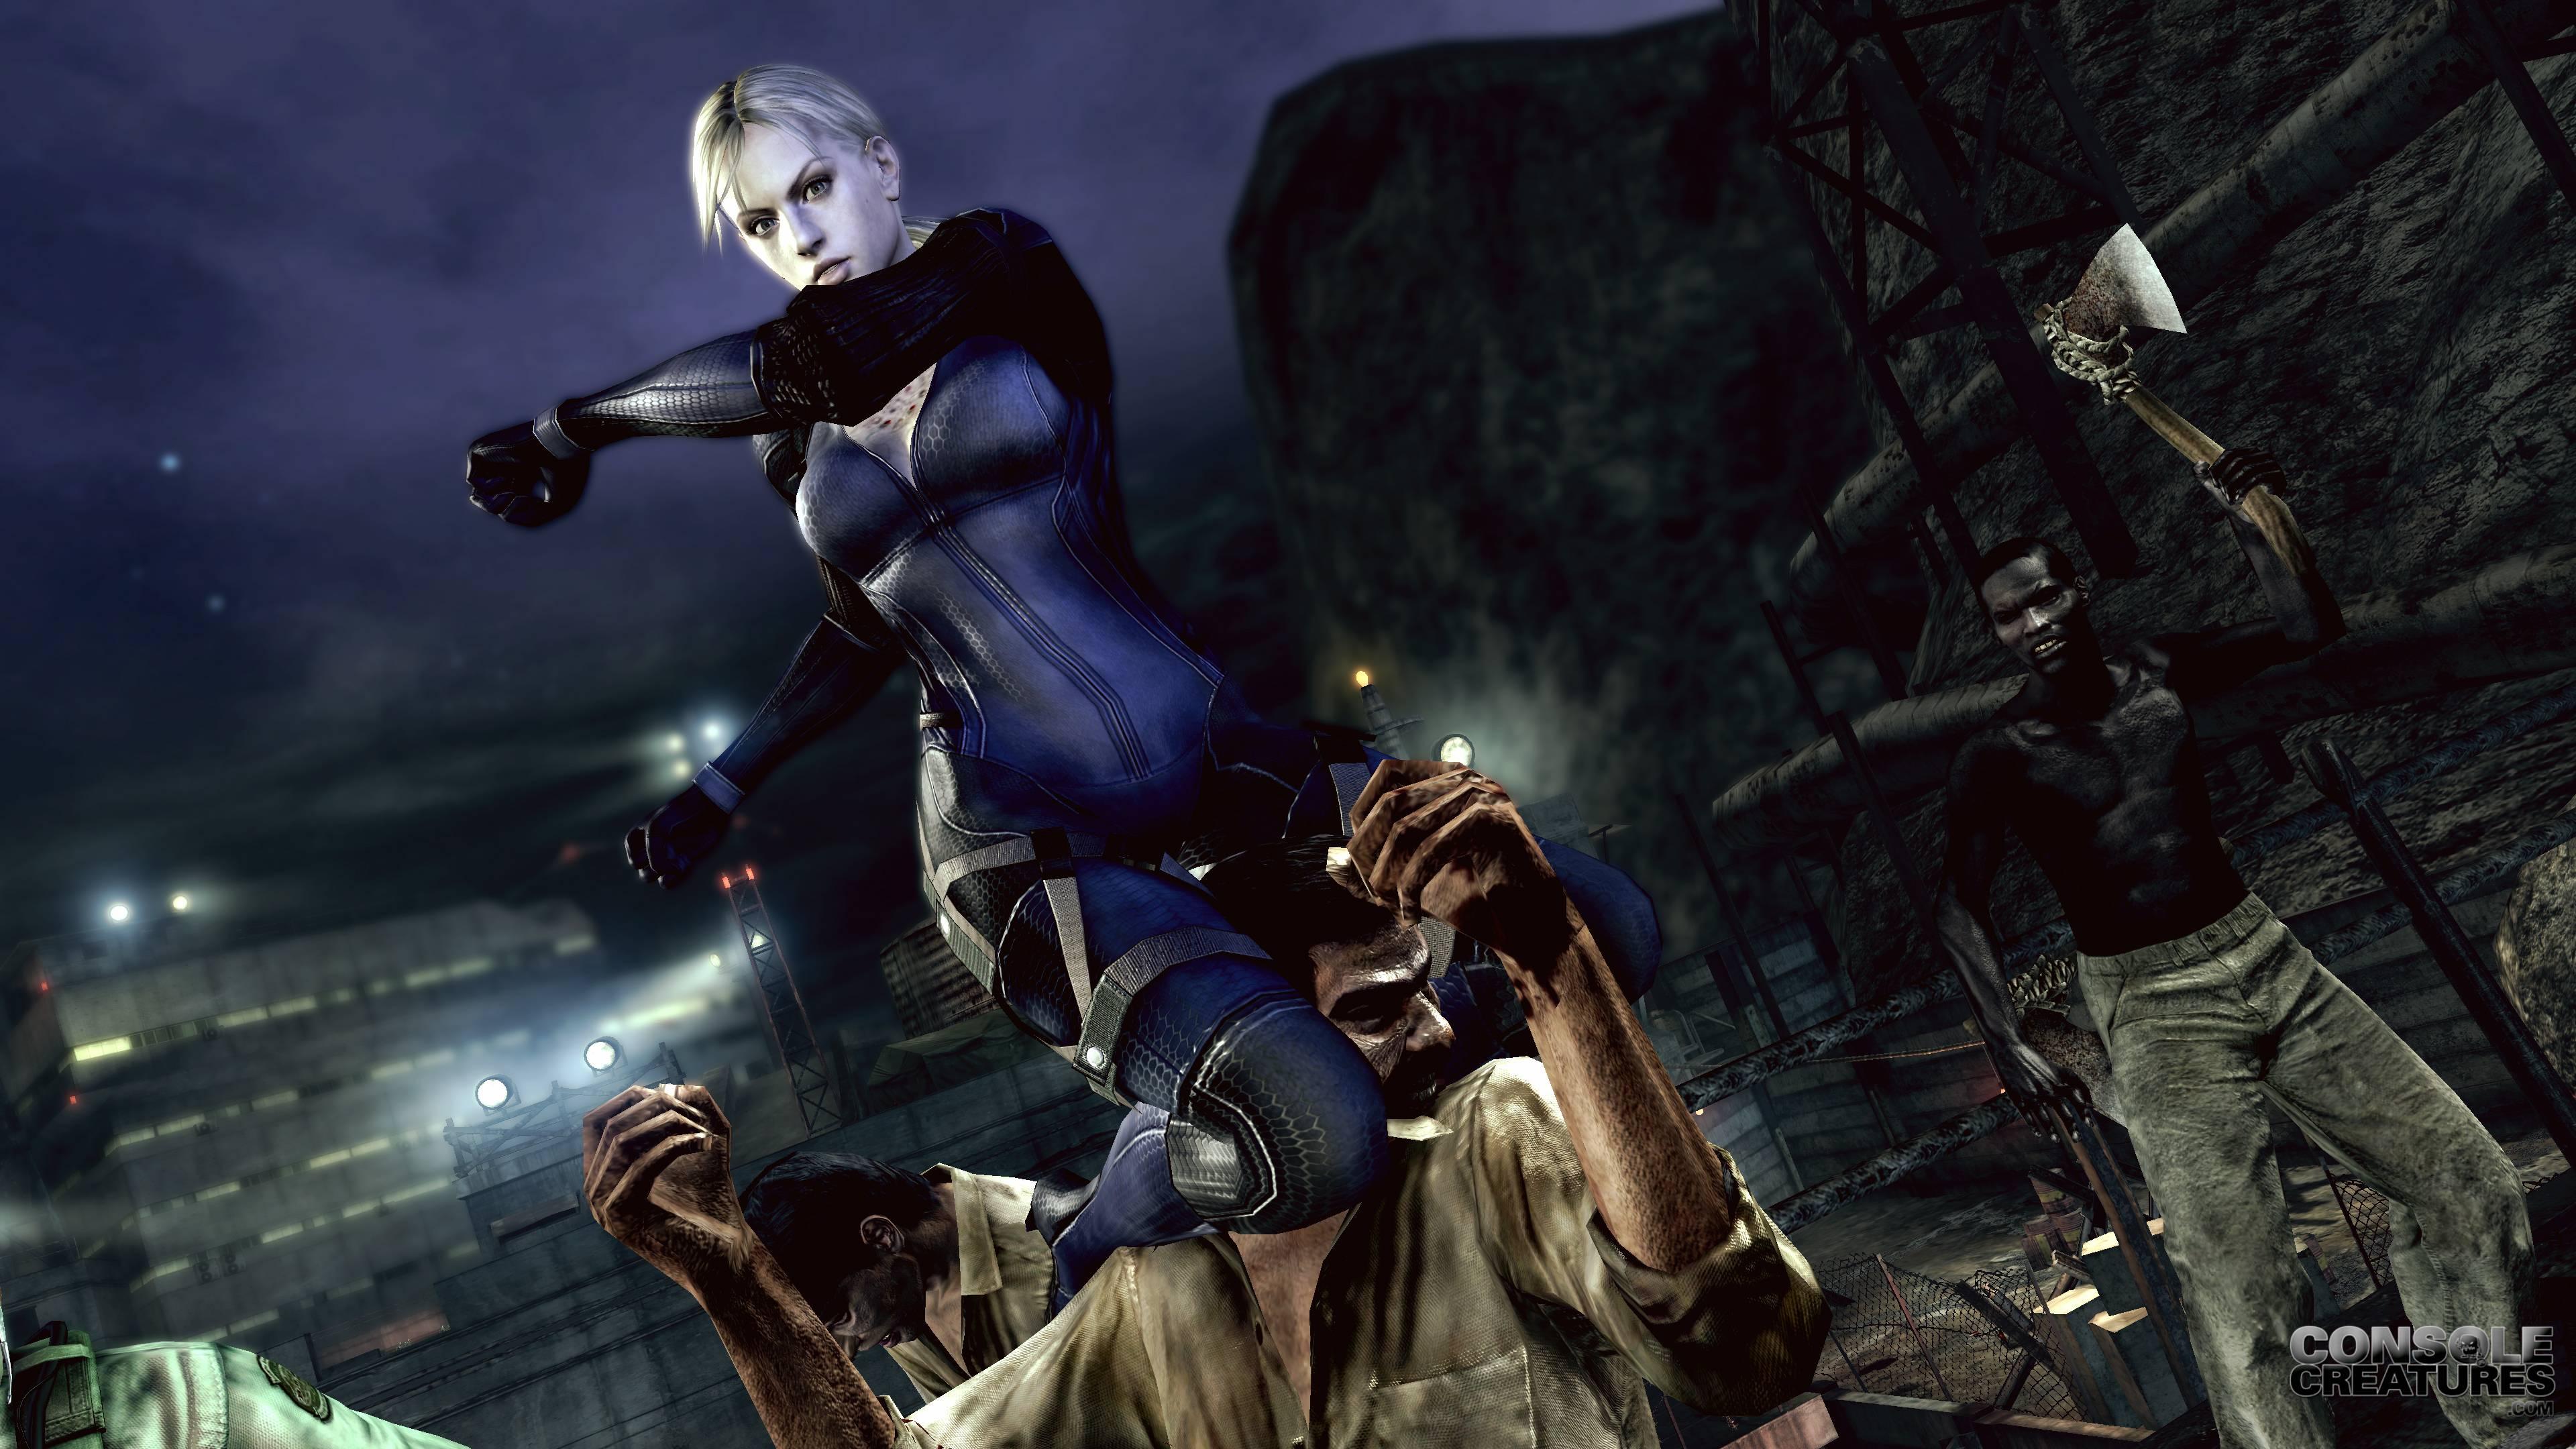 Resident Evil 5 Jill Valentine Wallpapers Wallpaper Cave